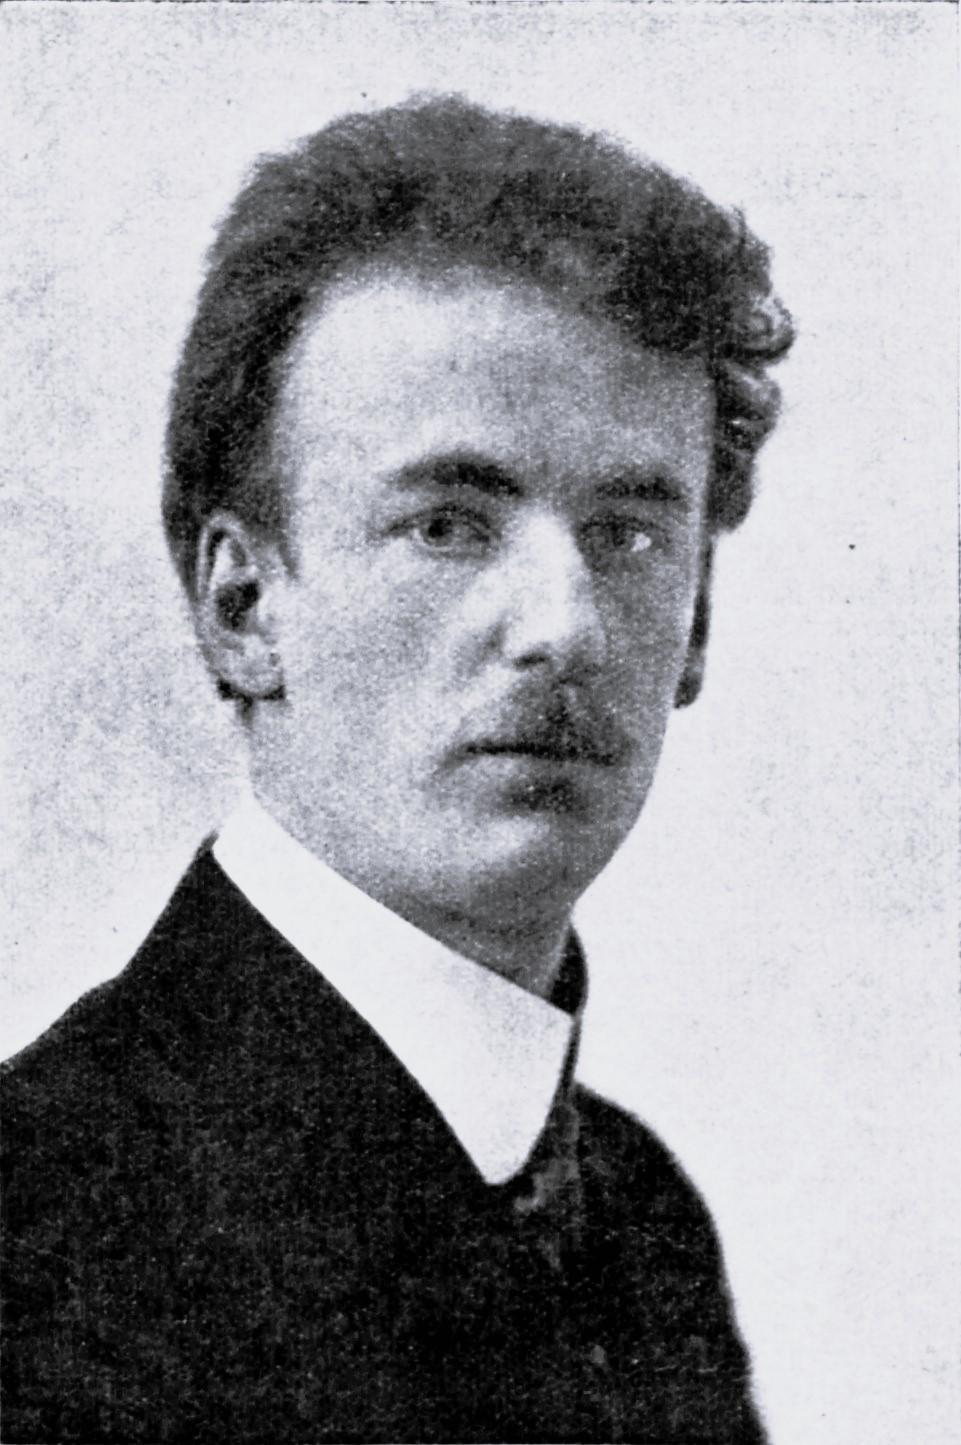 Wilhelm Furtwängler (1911)